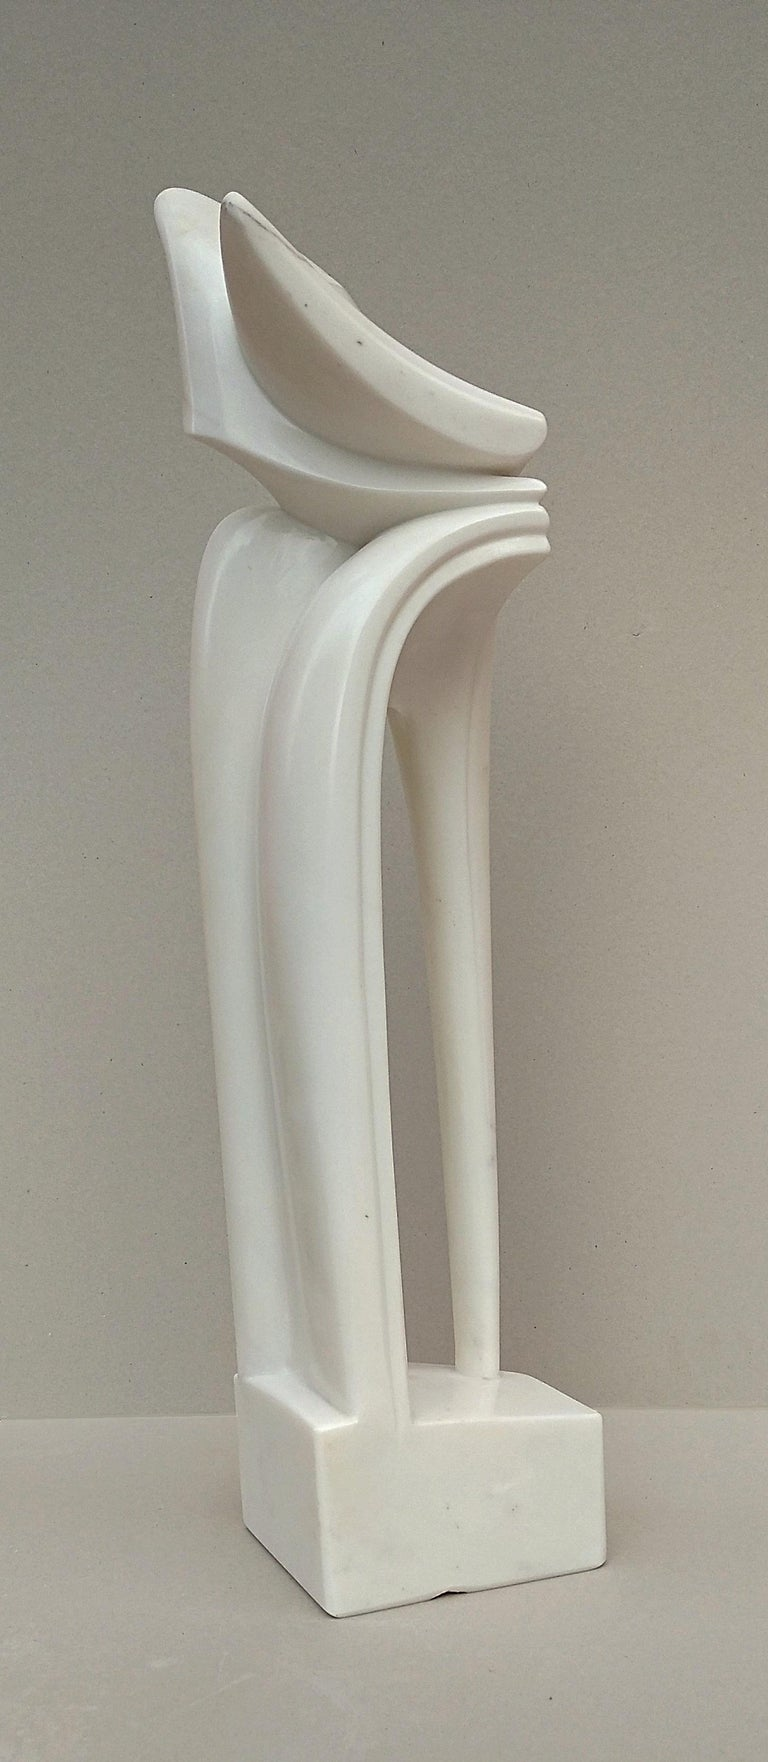 Arch, Sensual White Carrara Statuary Marble Stone Vertical Figurative Sculpture For Sale 4